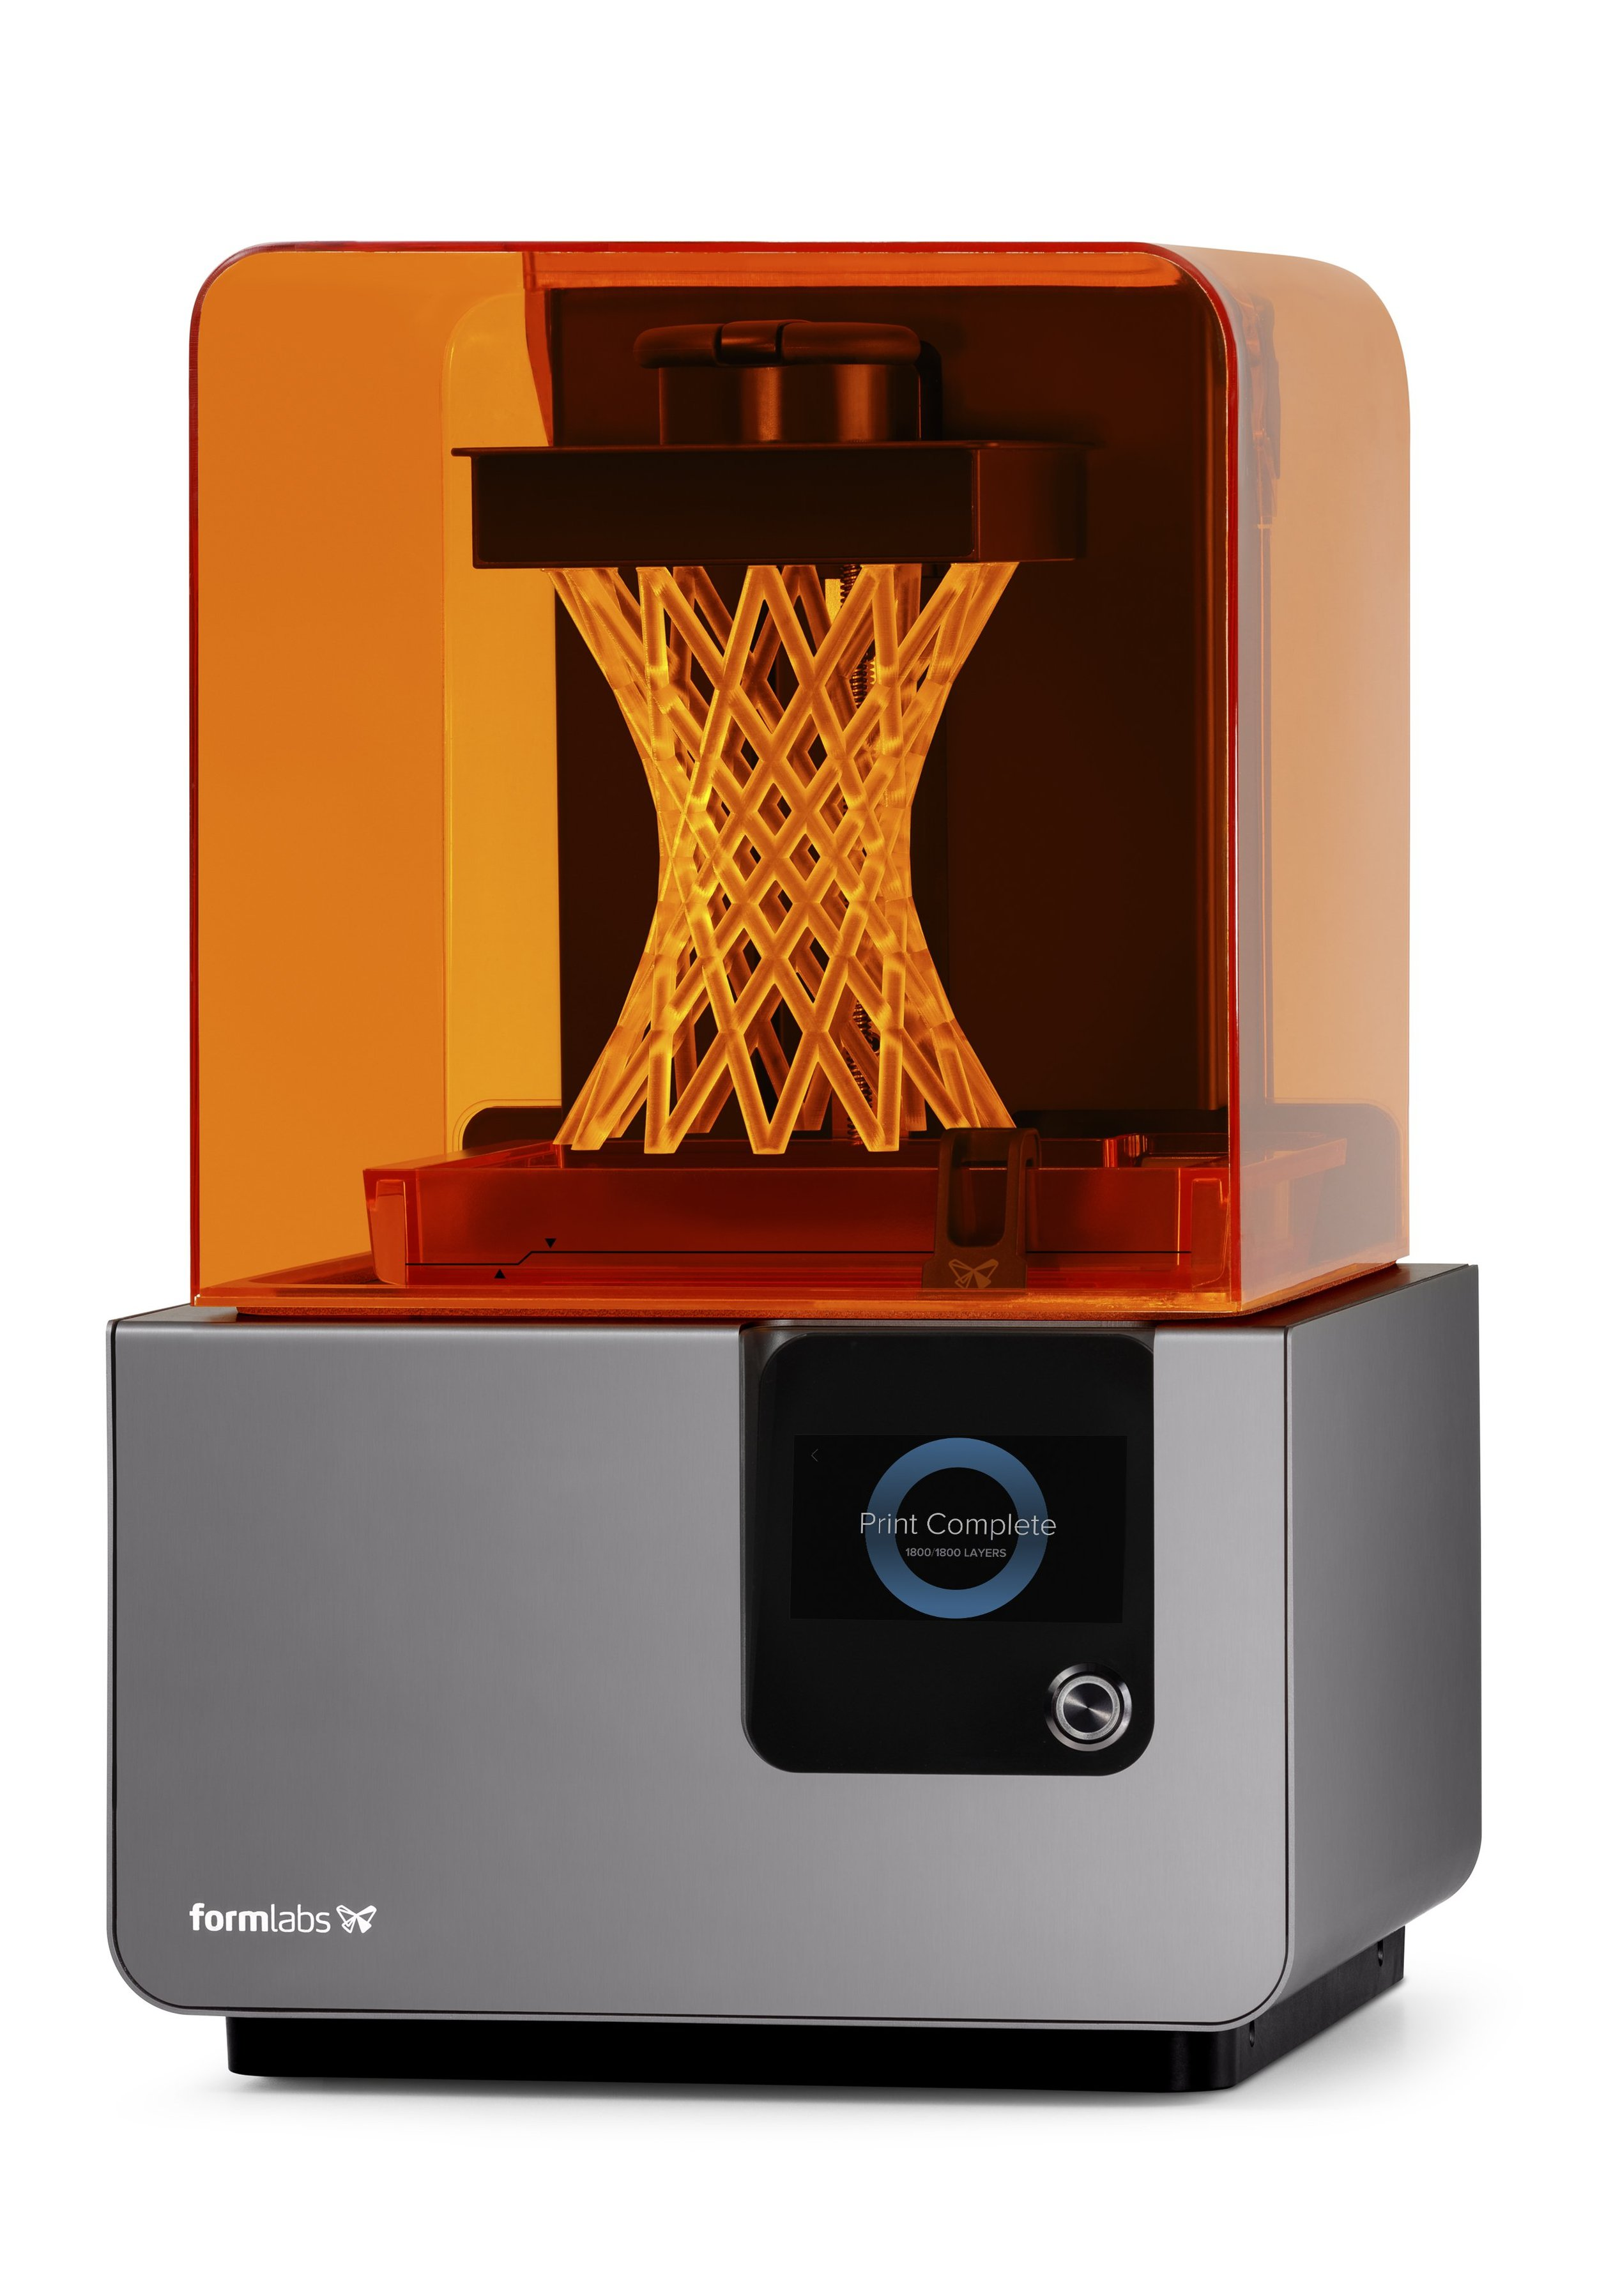 form-2-printer-three-quarters-hart1.jpg